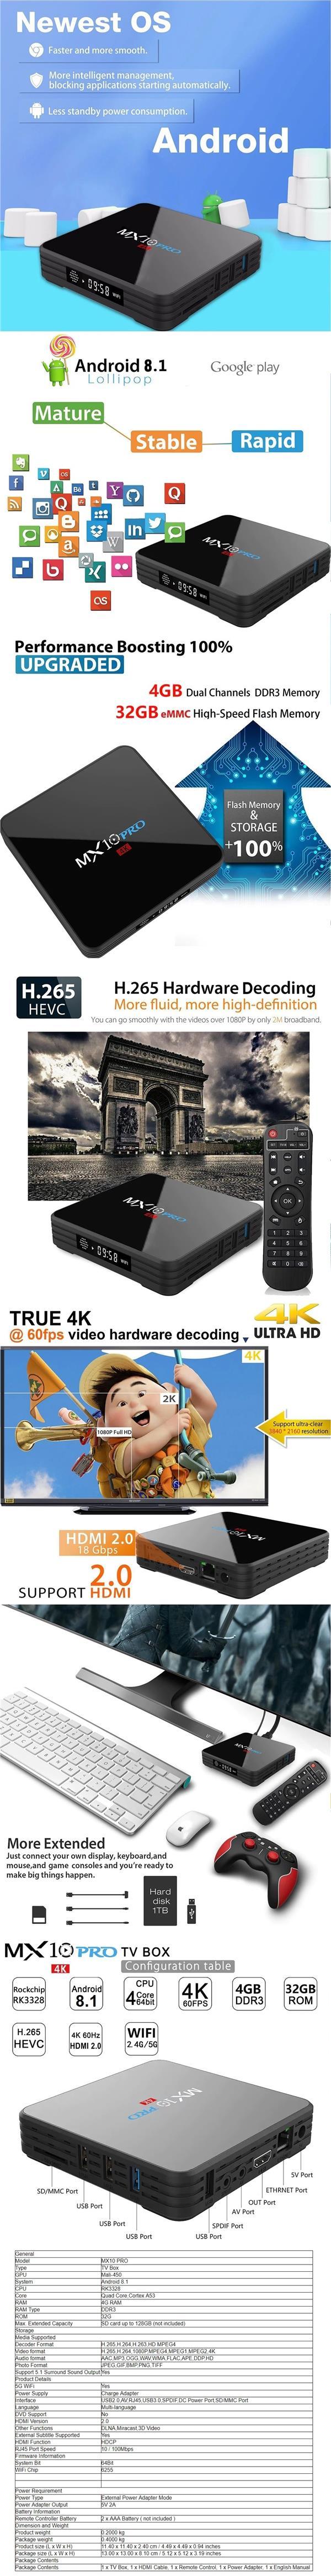 MX10 PRO 4G+32G Rockchip RK3328 Android TV Box /Bluetooth /4K/ IPTV